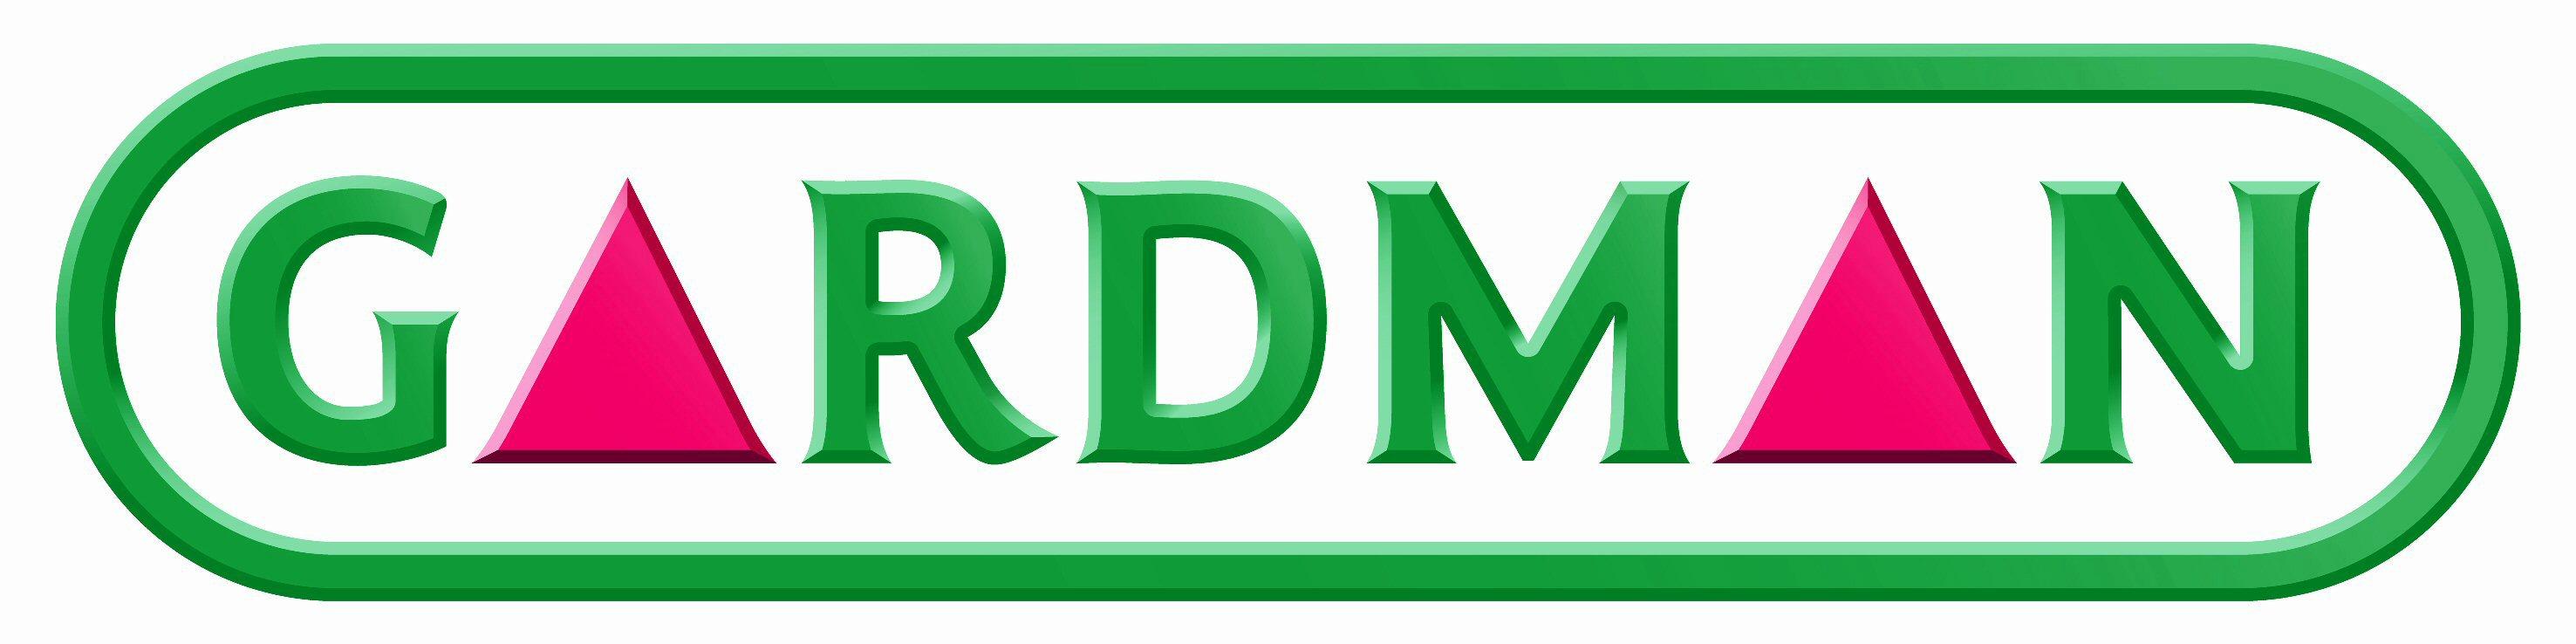 The Top 3 Best Gardman Bird Feeding Stations to Buy in 2017